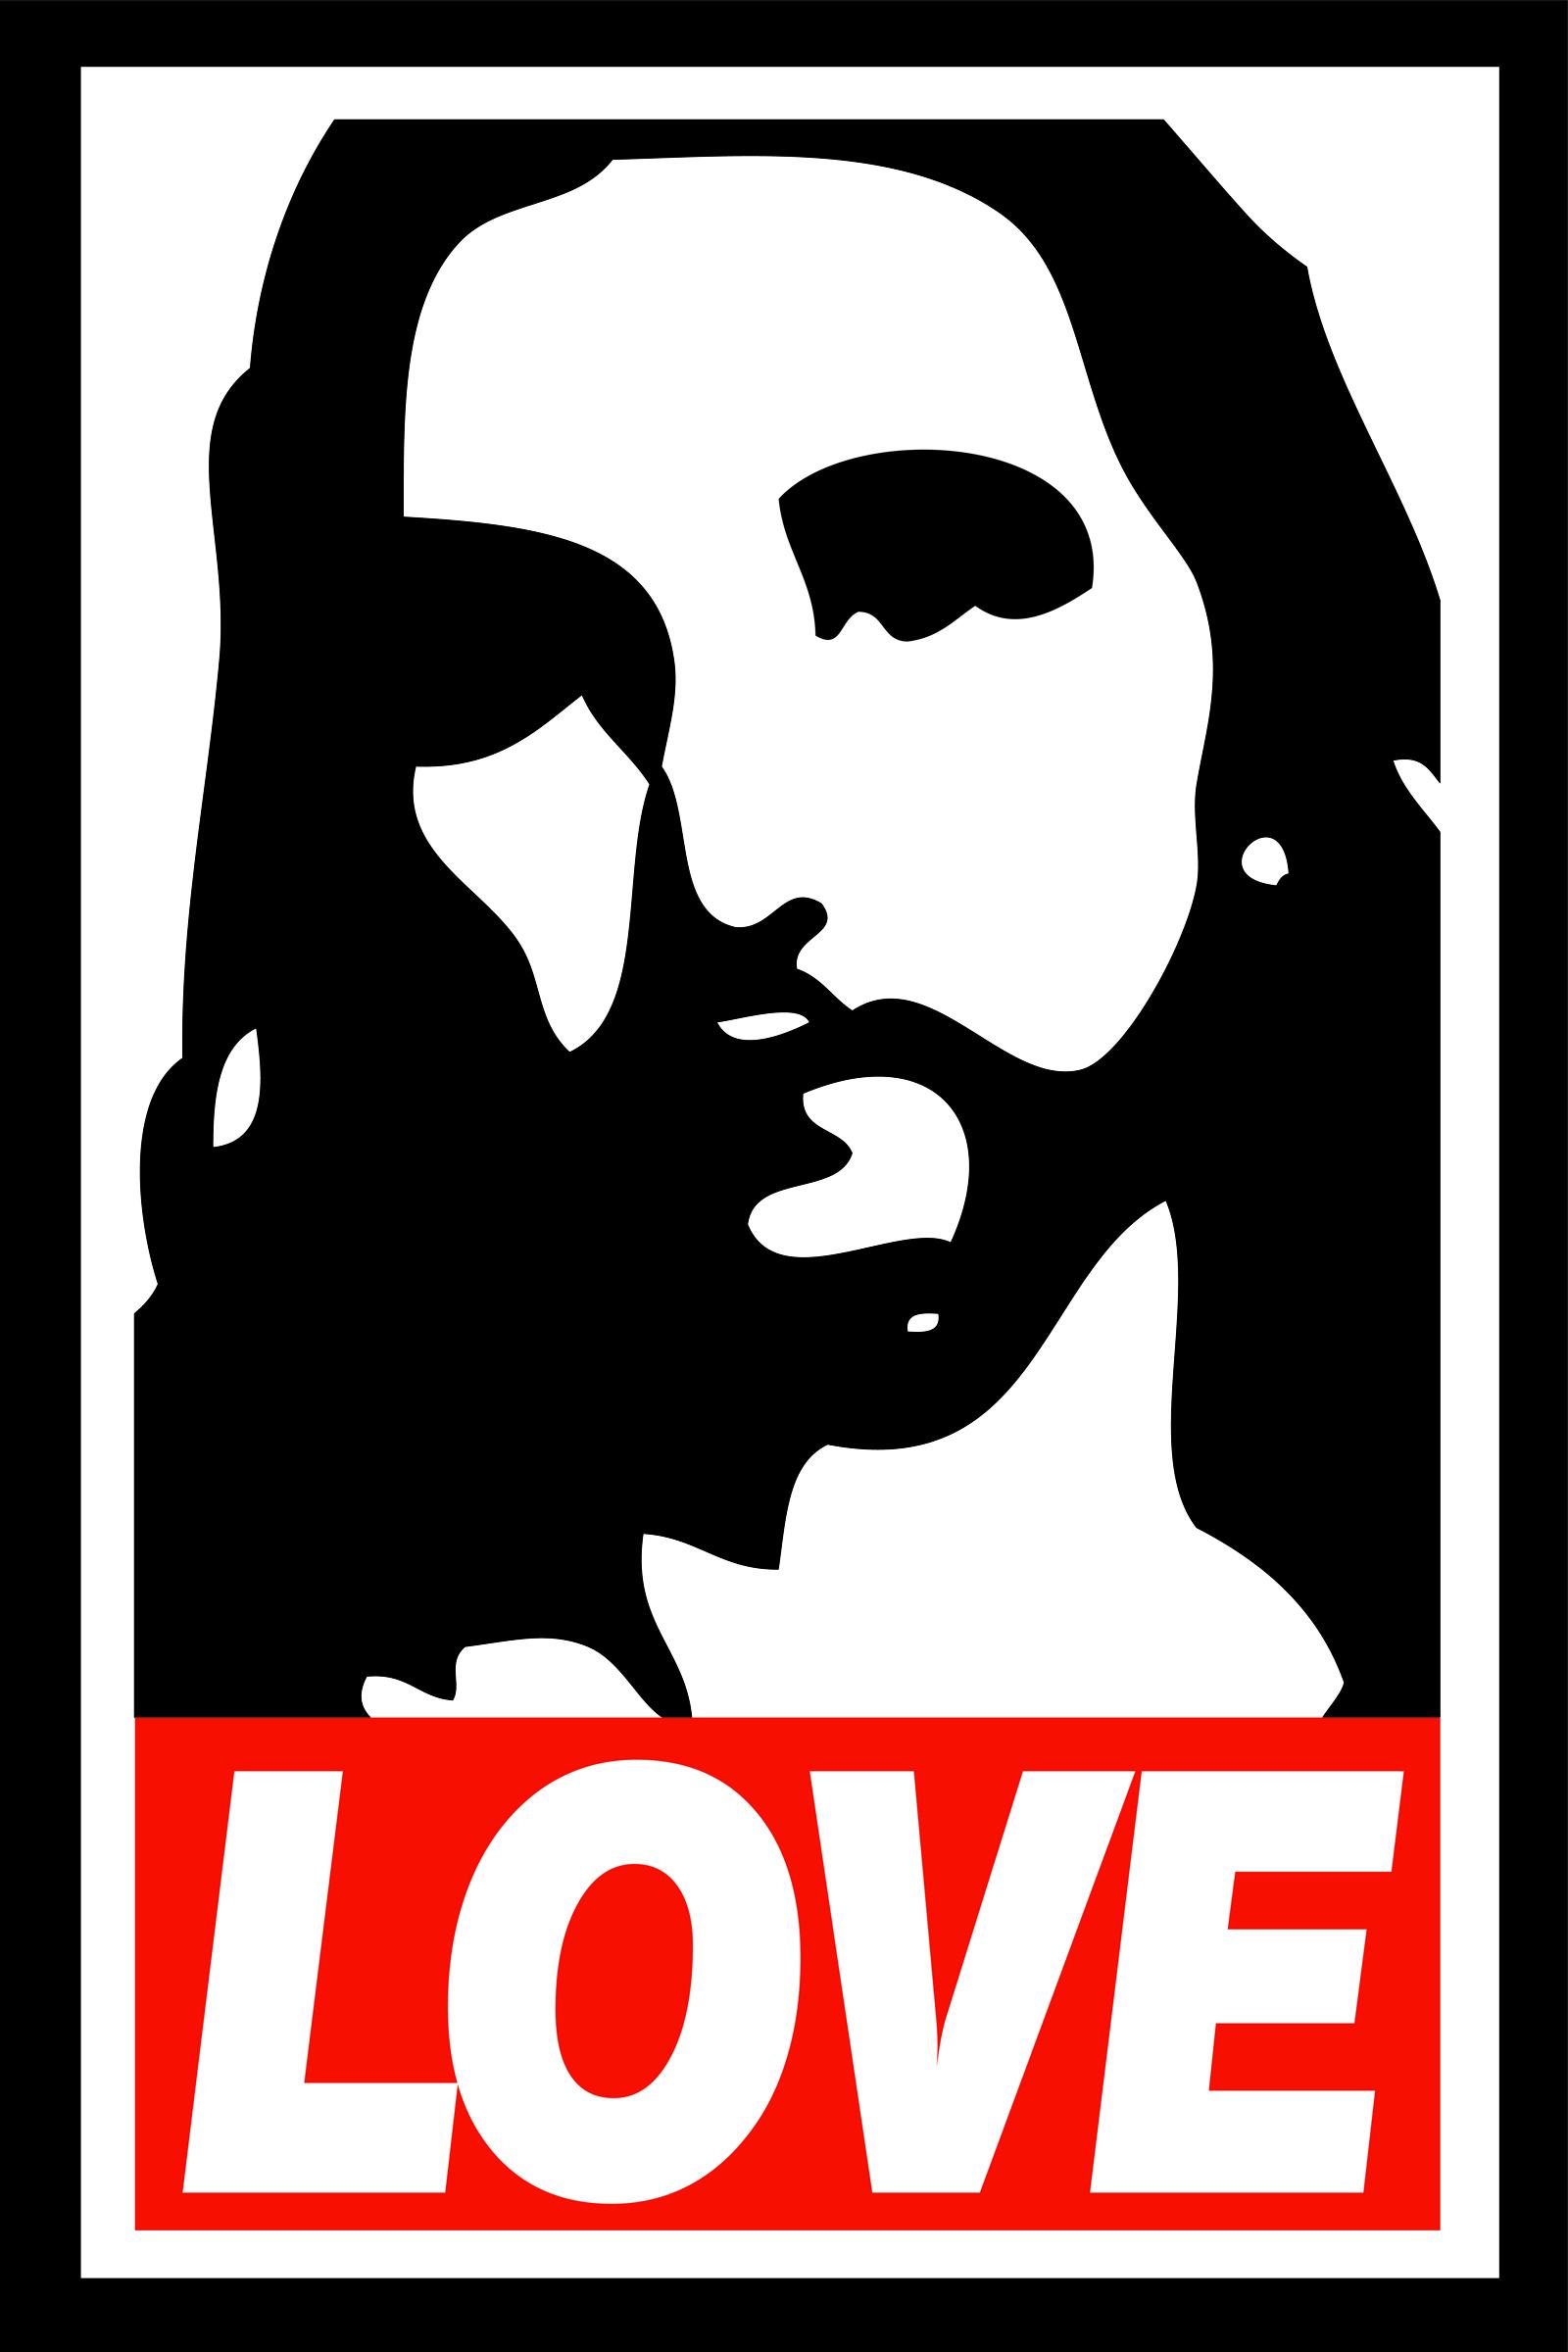 OBEY-Love.jpg